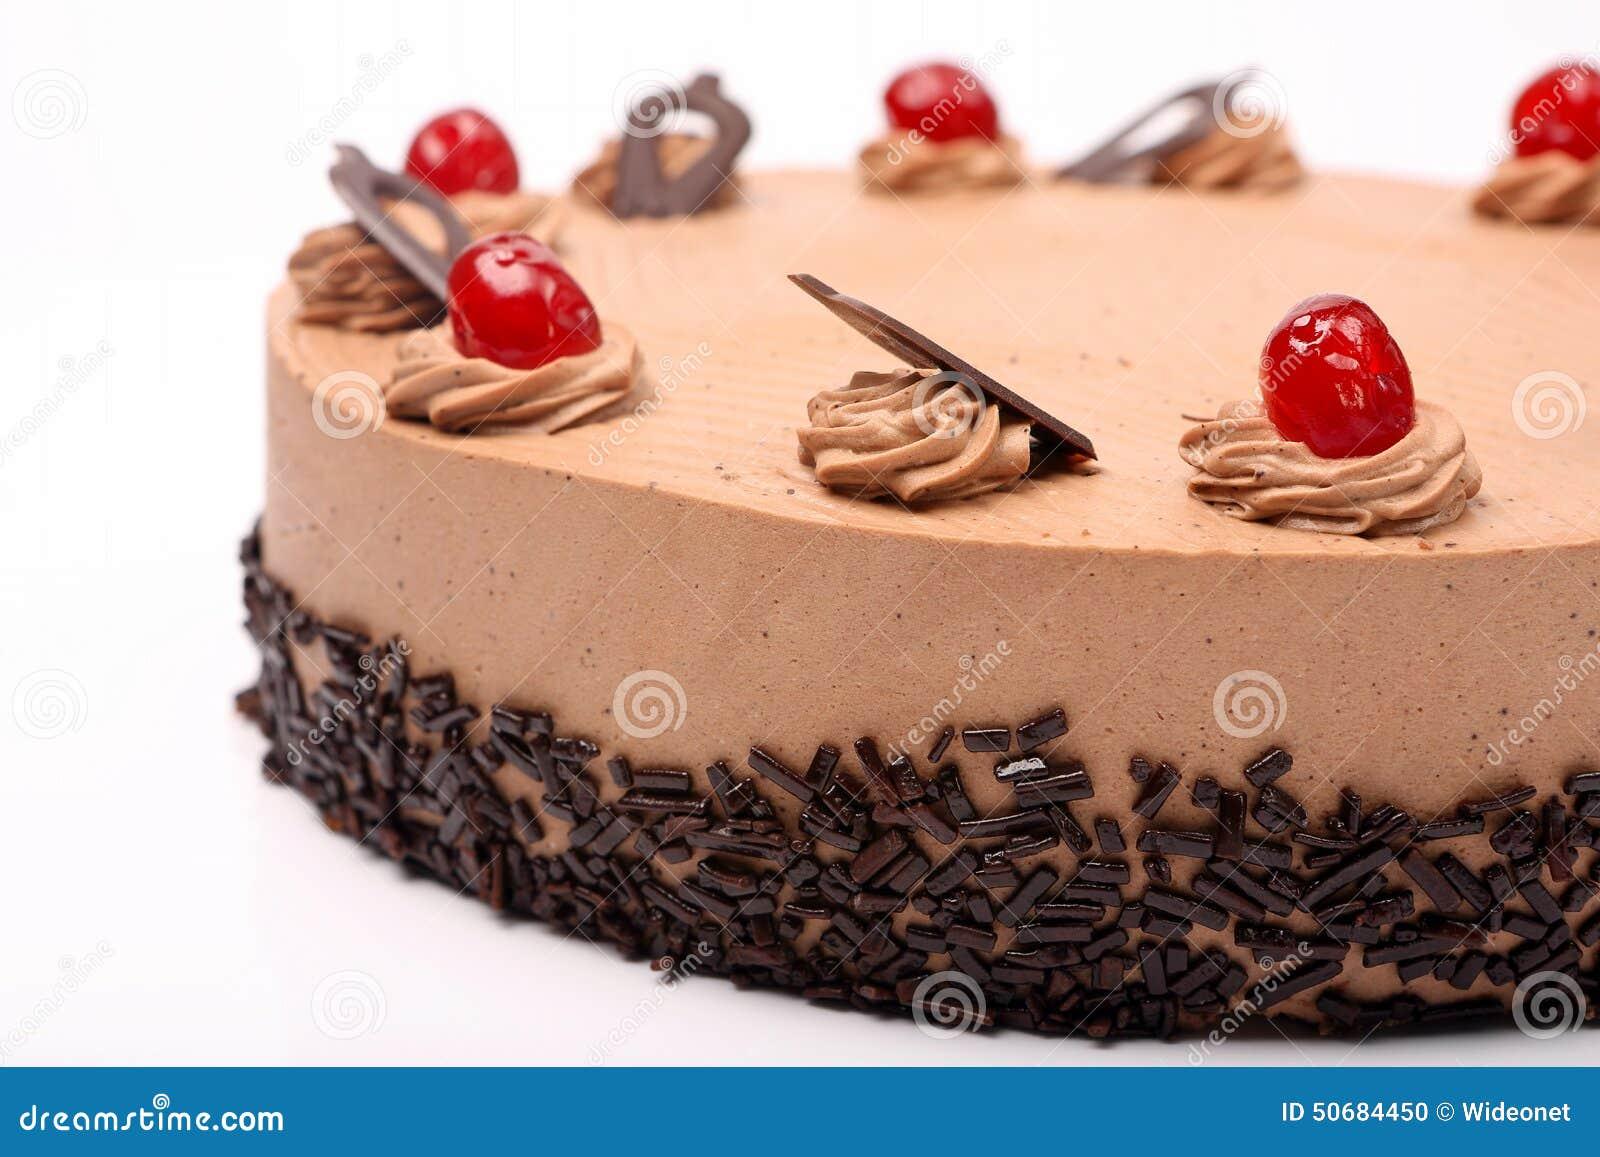 Download 奶油色可可粉蛋糕用在白色背景的樱桃 库存照片. 图片 包括有 背包, 可可粉, 厨师, 烘烤, 咖啡, 果仁巧克力 - 50684450